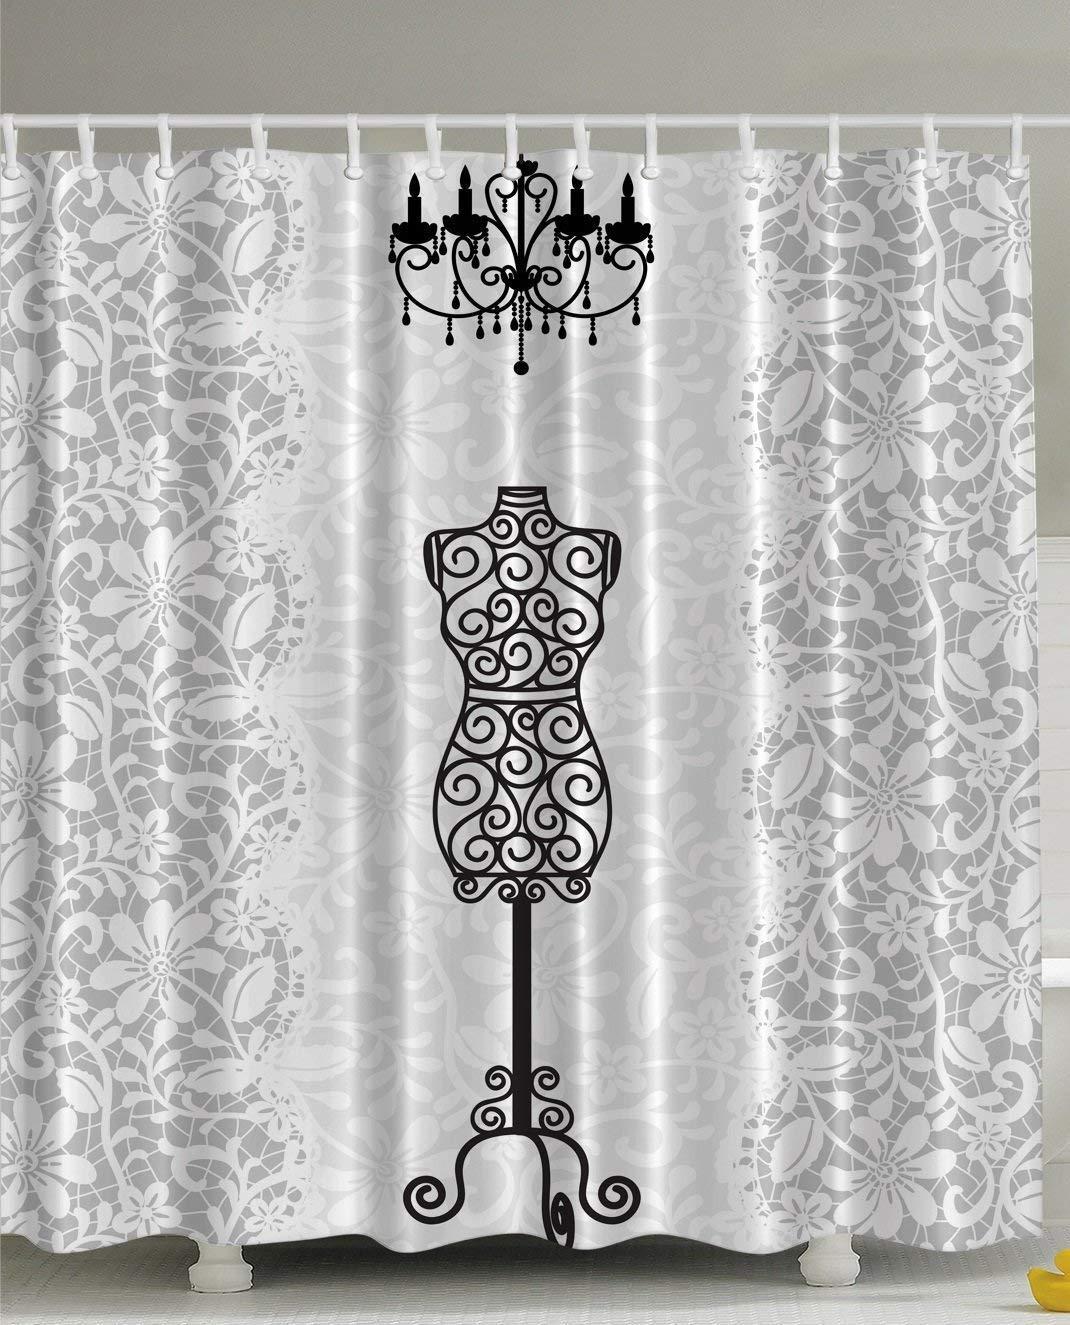 Diversión sexy gris Curtain Shower Curtain gris Female Dress Form Mannequin Black Chandelier White Lace Home Woman Fashion Theme Item Bathroom Decorating Modern Art Print Polyester Fabric Shower Curtain gris Black 72 X 72